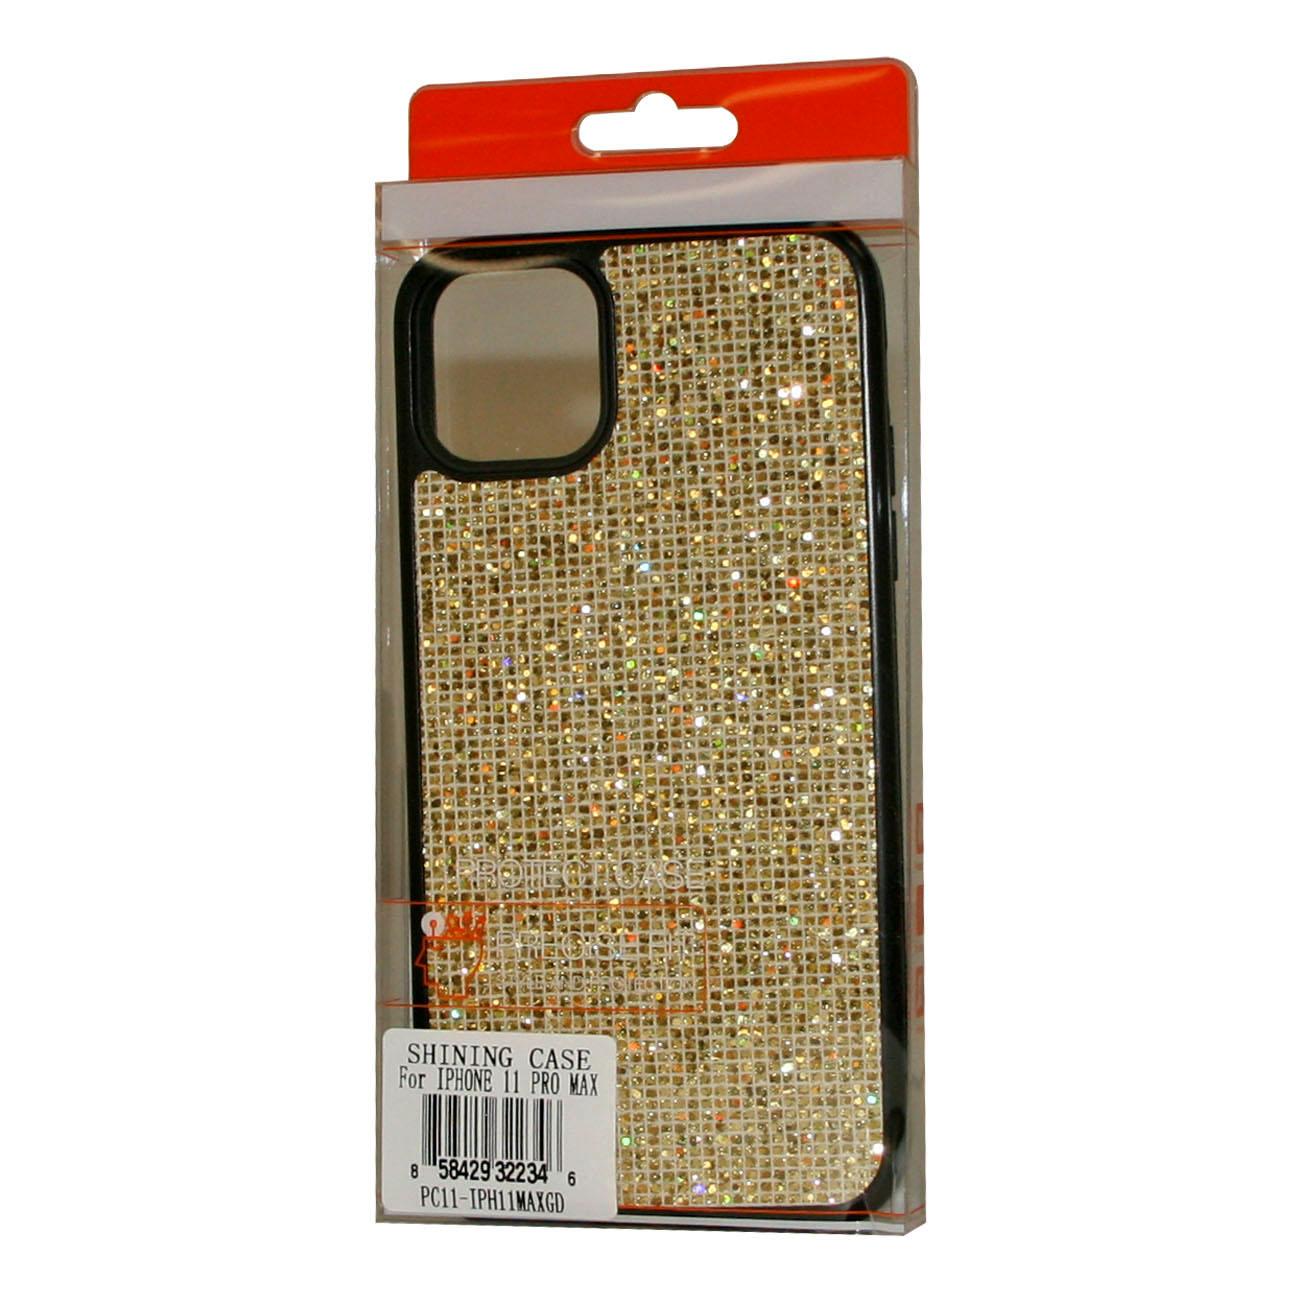 DIAMOND RHINESTONE Case For APPLE IPHONE 11 PRO MAX In Gold